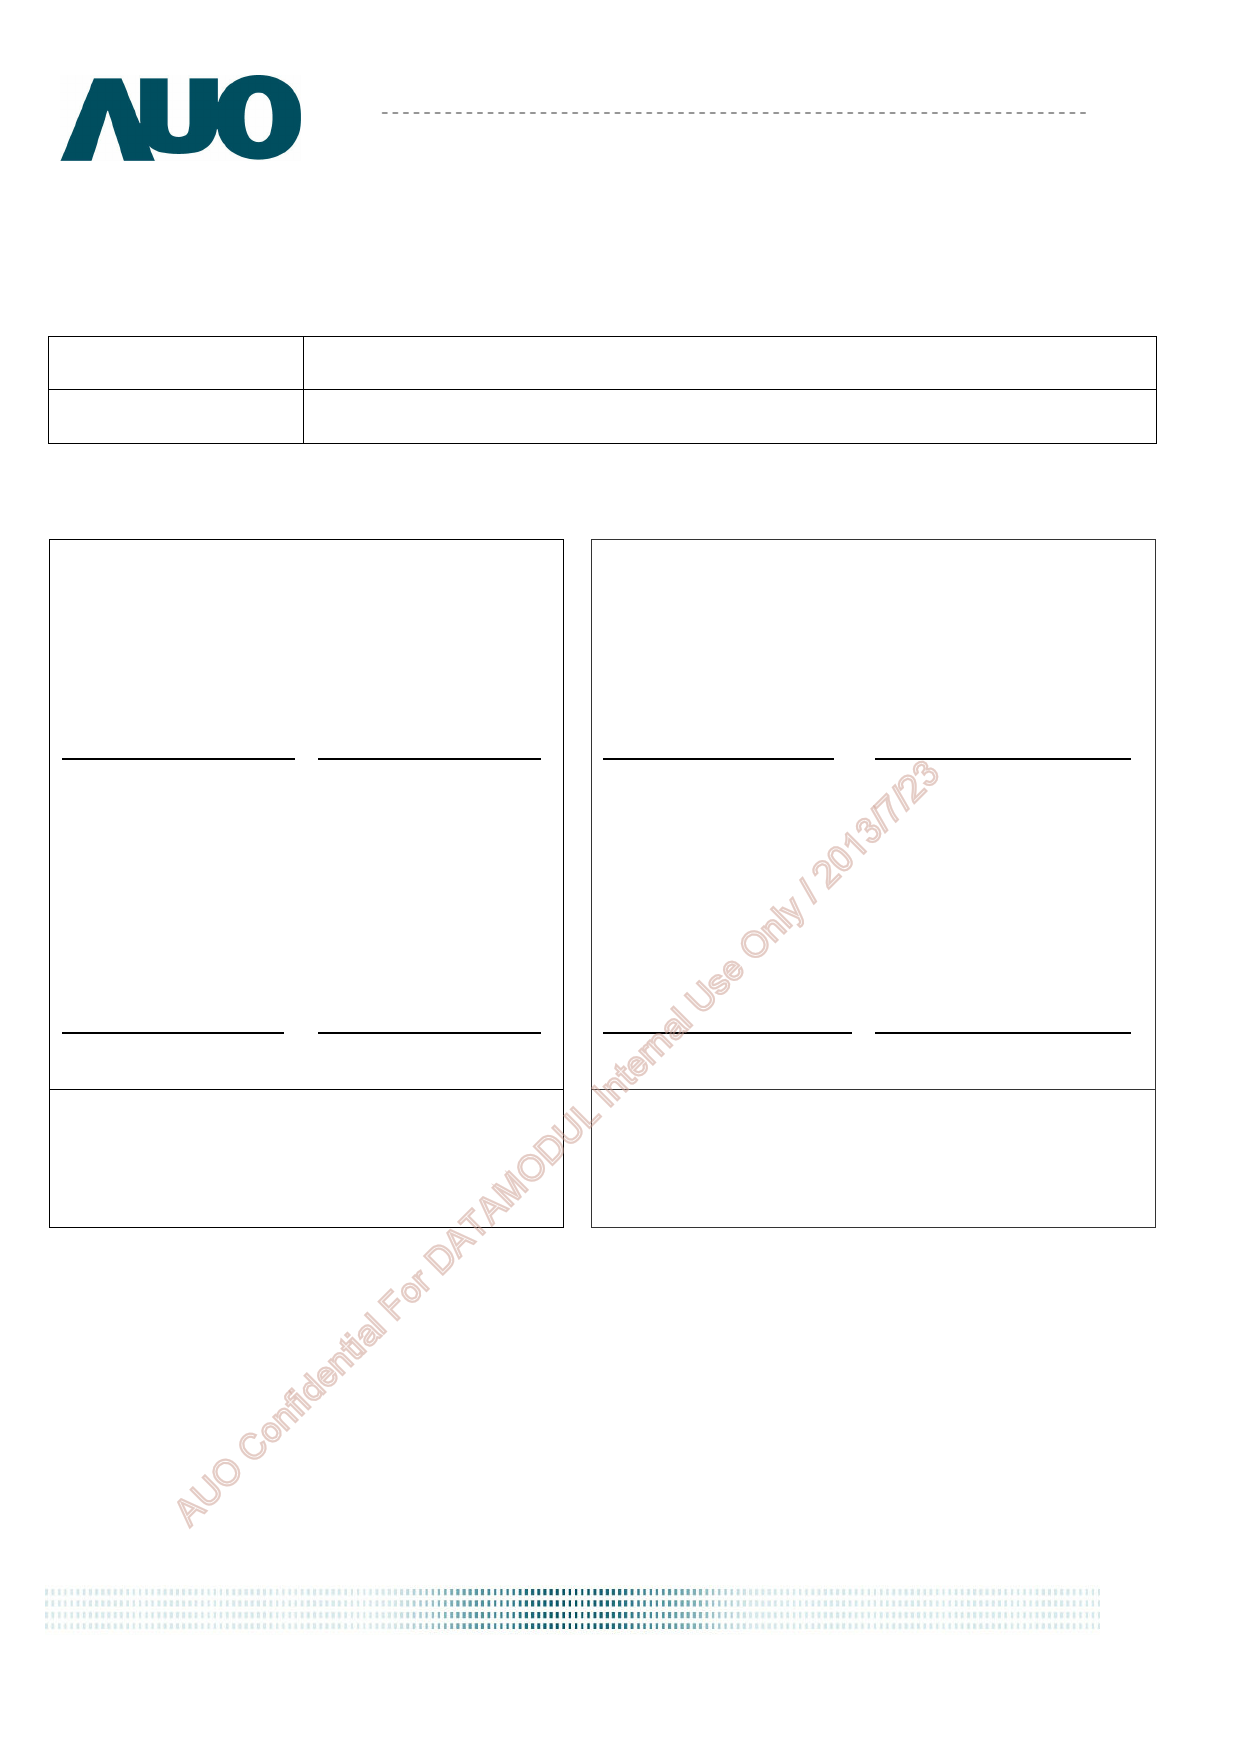 G057QN01-V2 datasheet